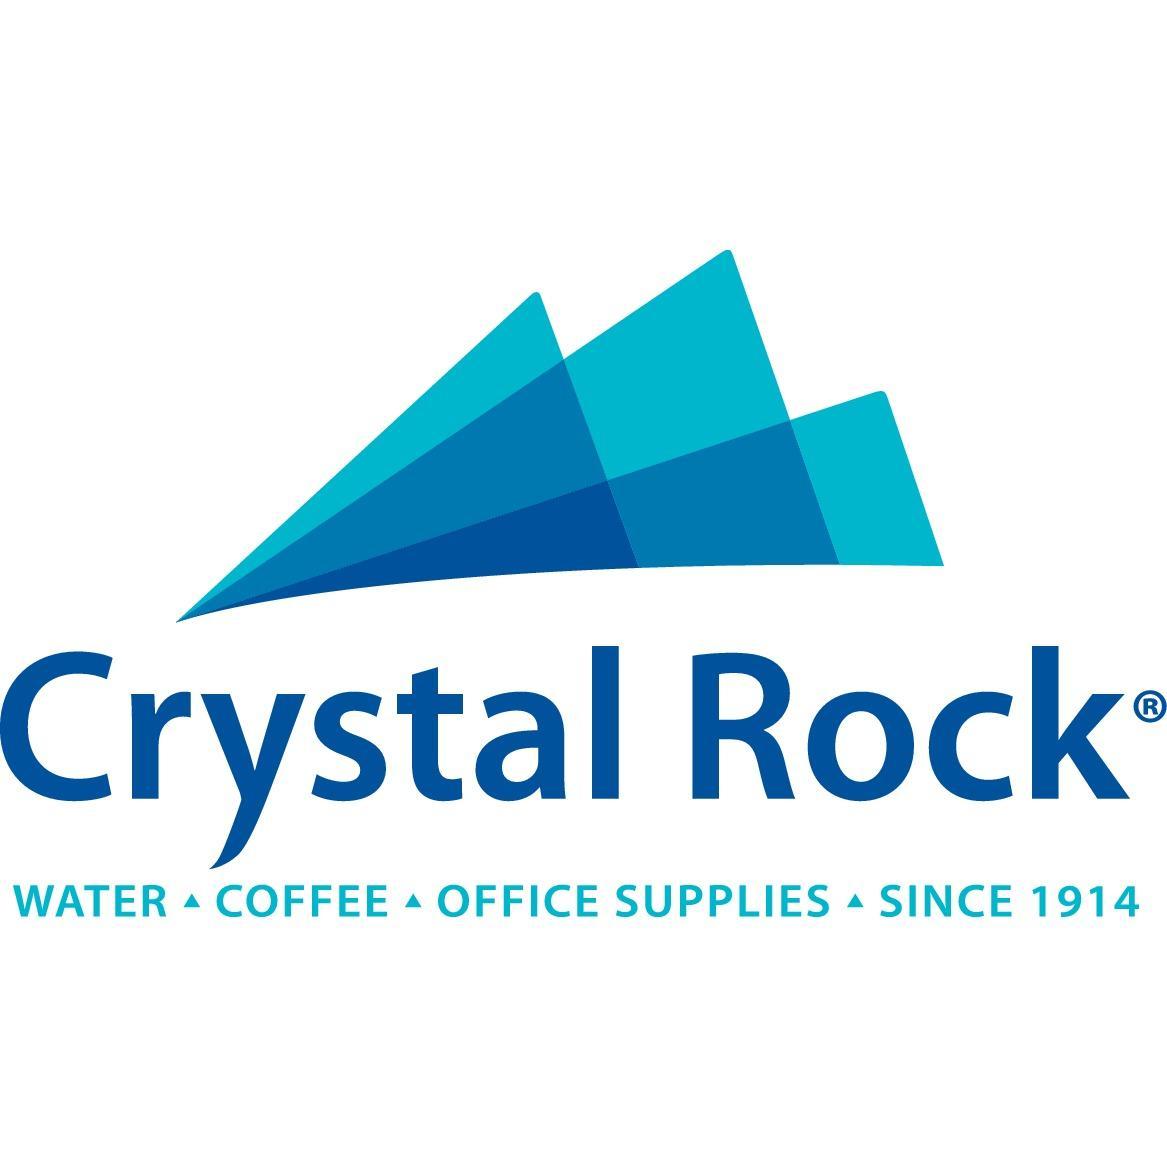 Crystal Rock Water